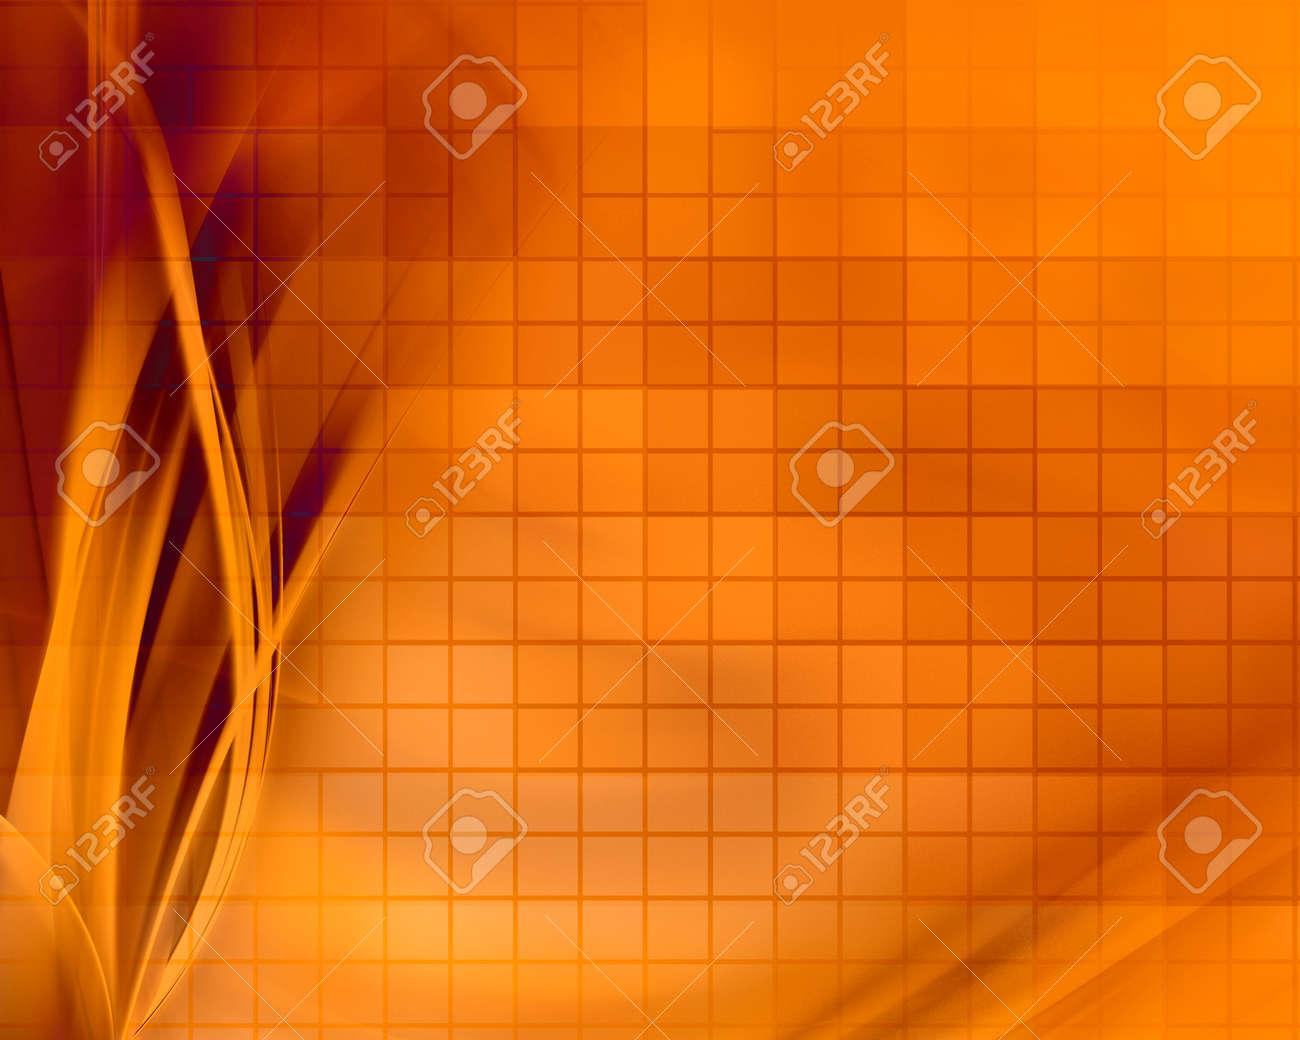 Nice design background or fractal element Stock Photo - 1564740